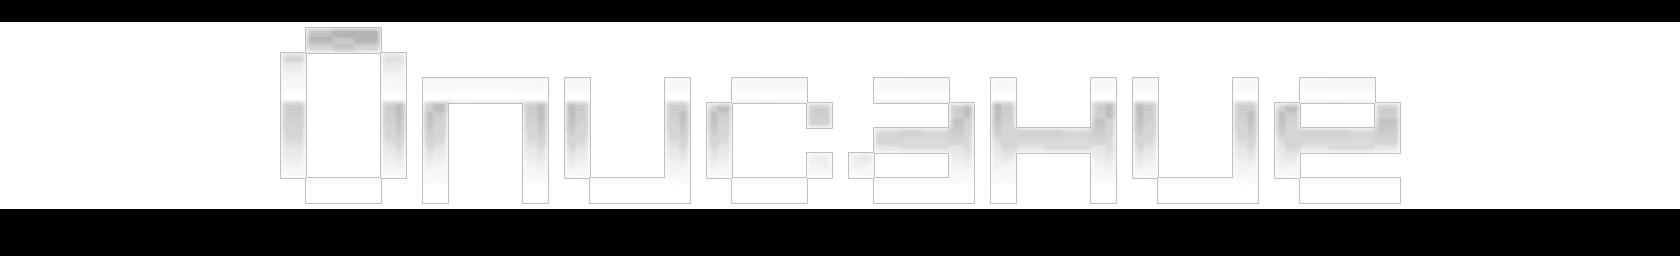 FTB Infinity Evolved - оптимизированная сборка [1 7 10][1GB RAM